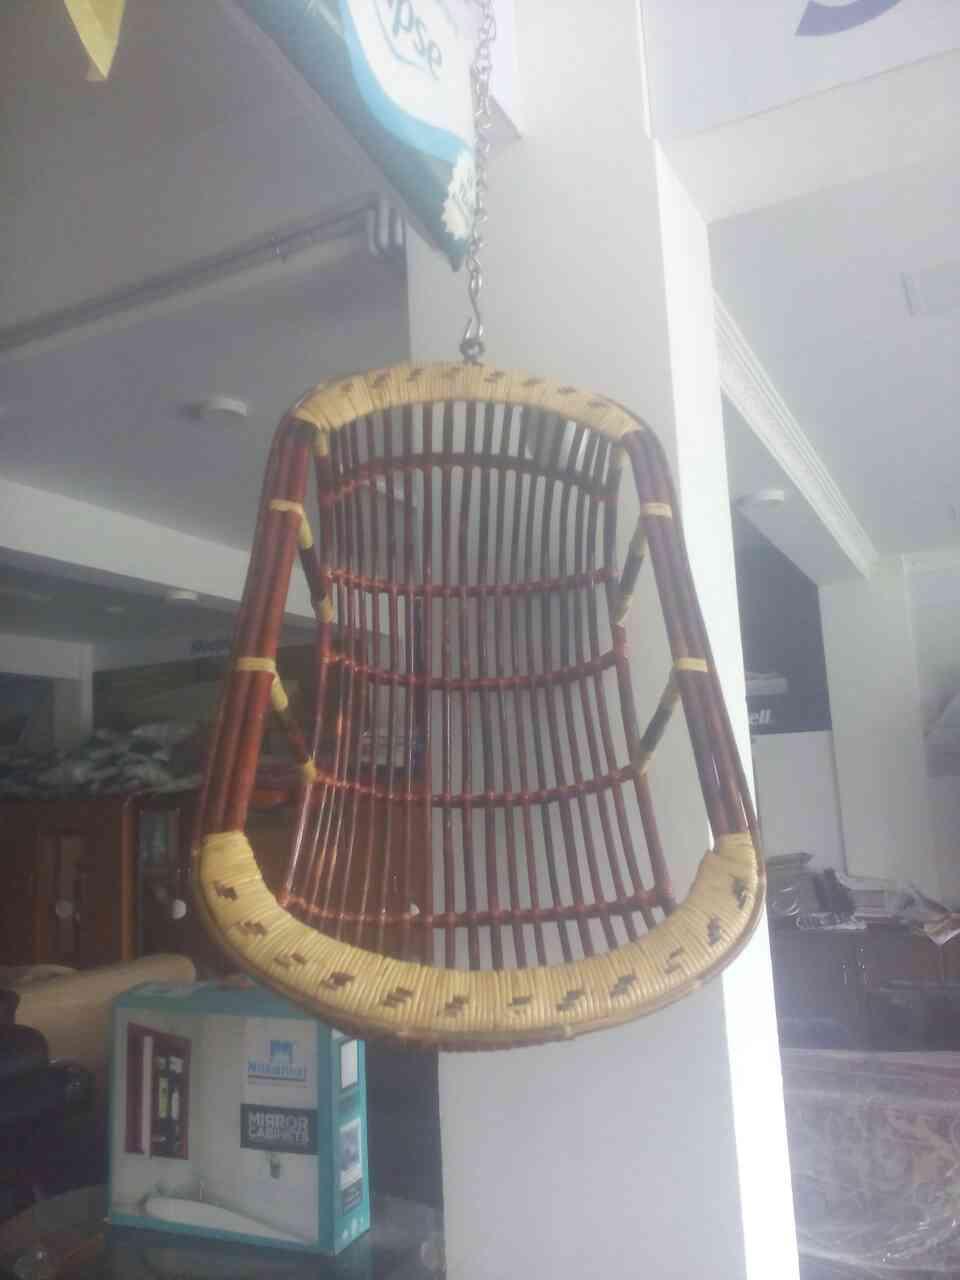 wooden shofisicated chair